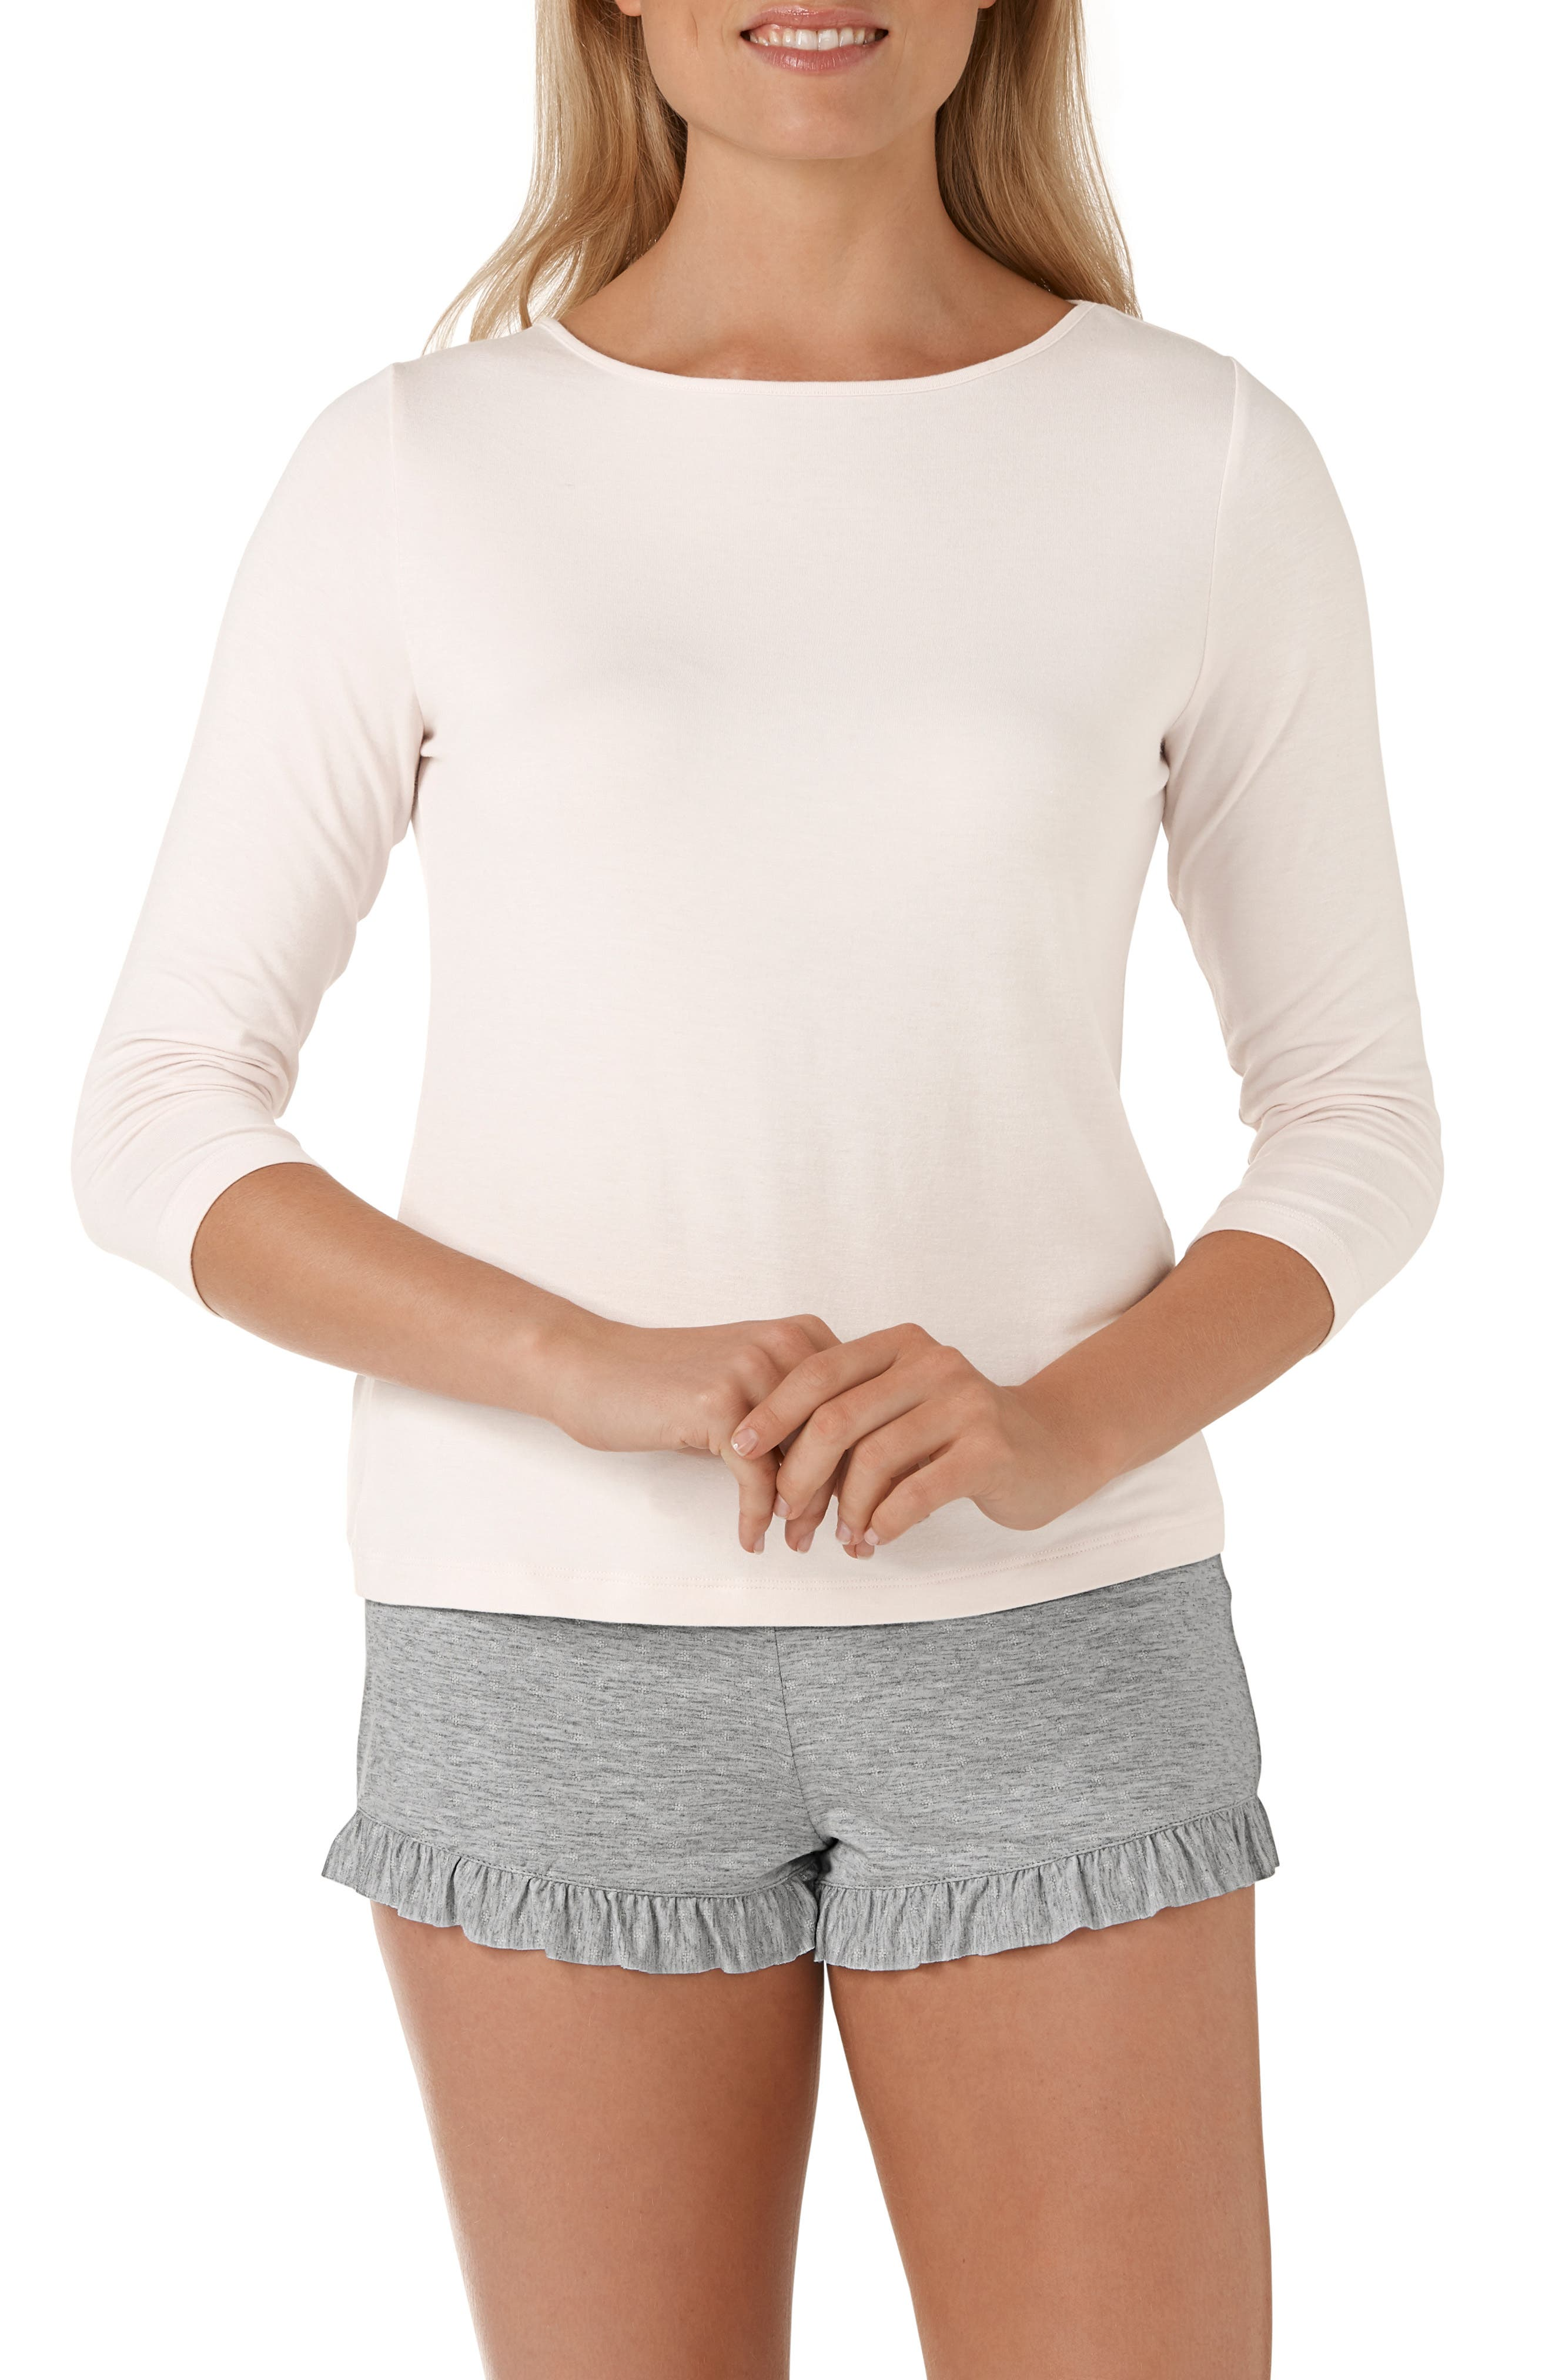 Foulard Star Two Piece Pajamas,                         Main,                         color, PINK/ GREY / WHITE